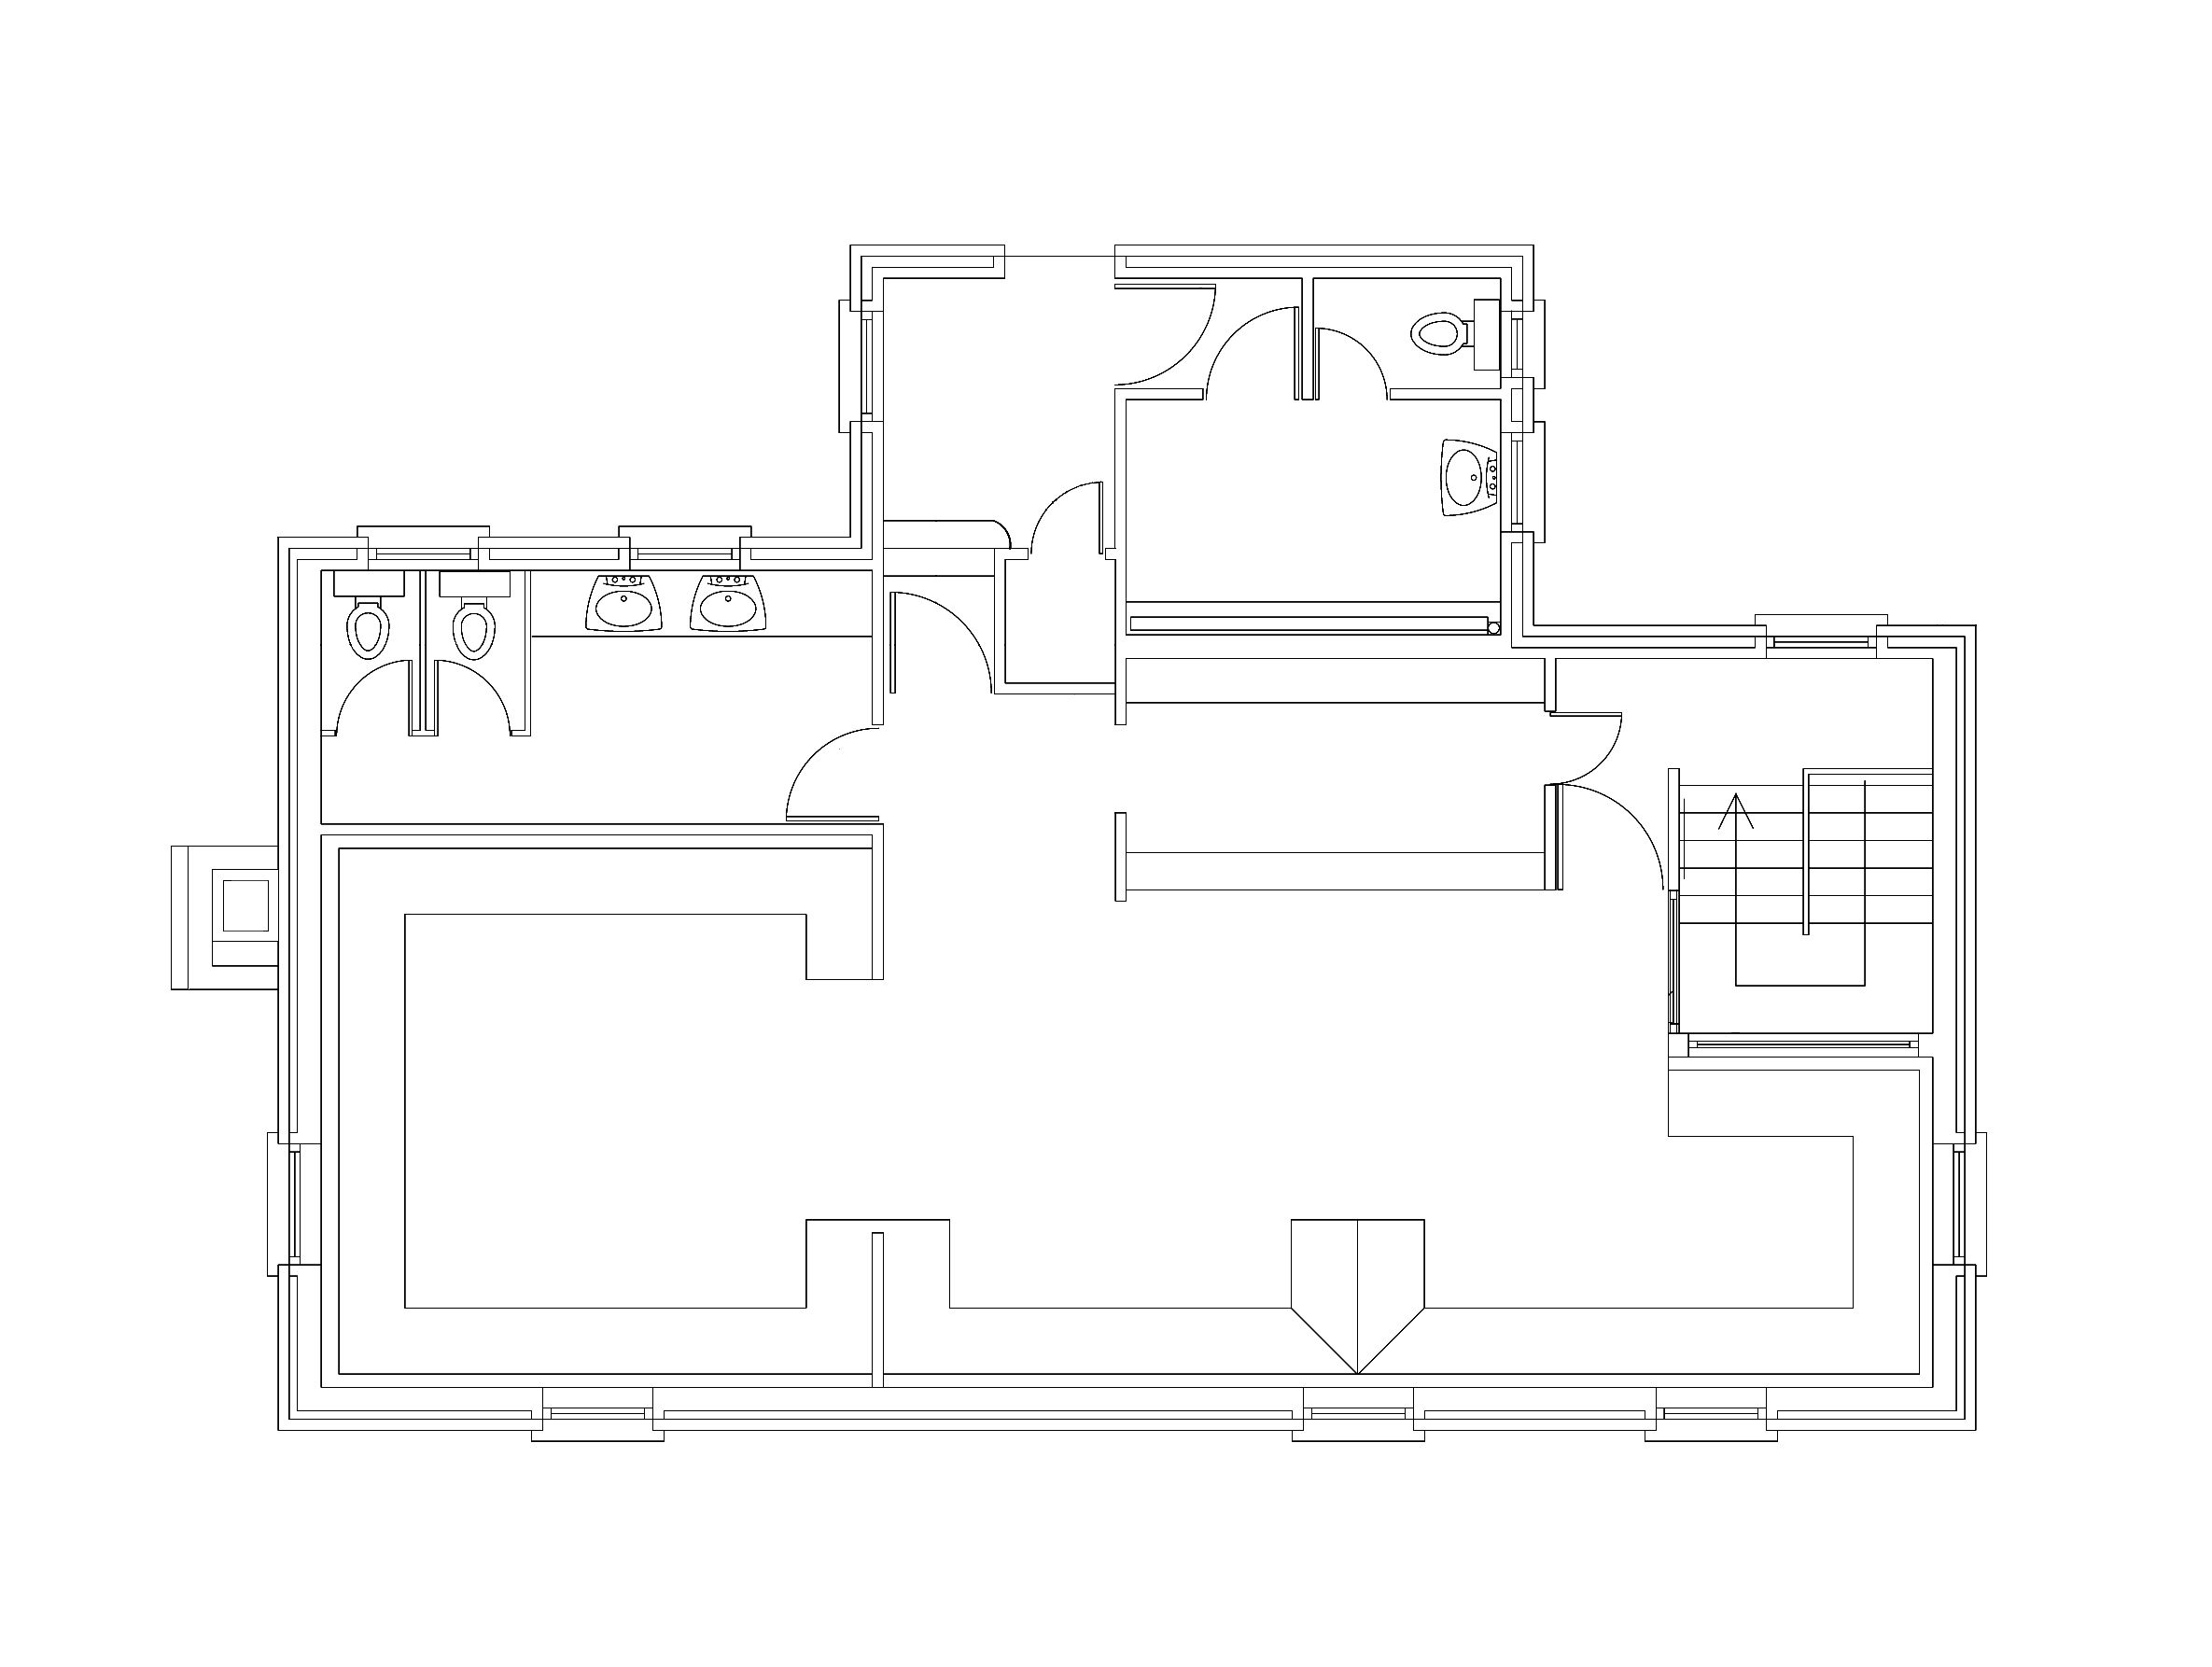 C143 Graphic.jpg